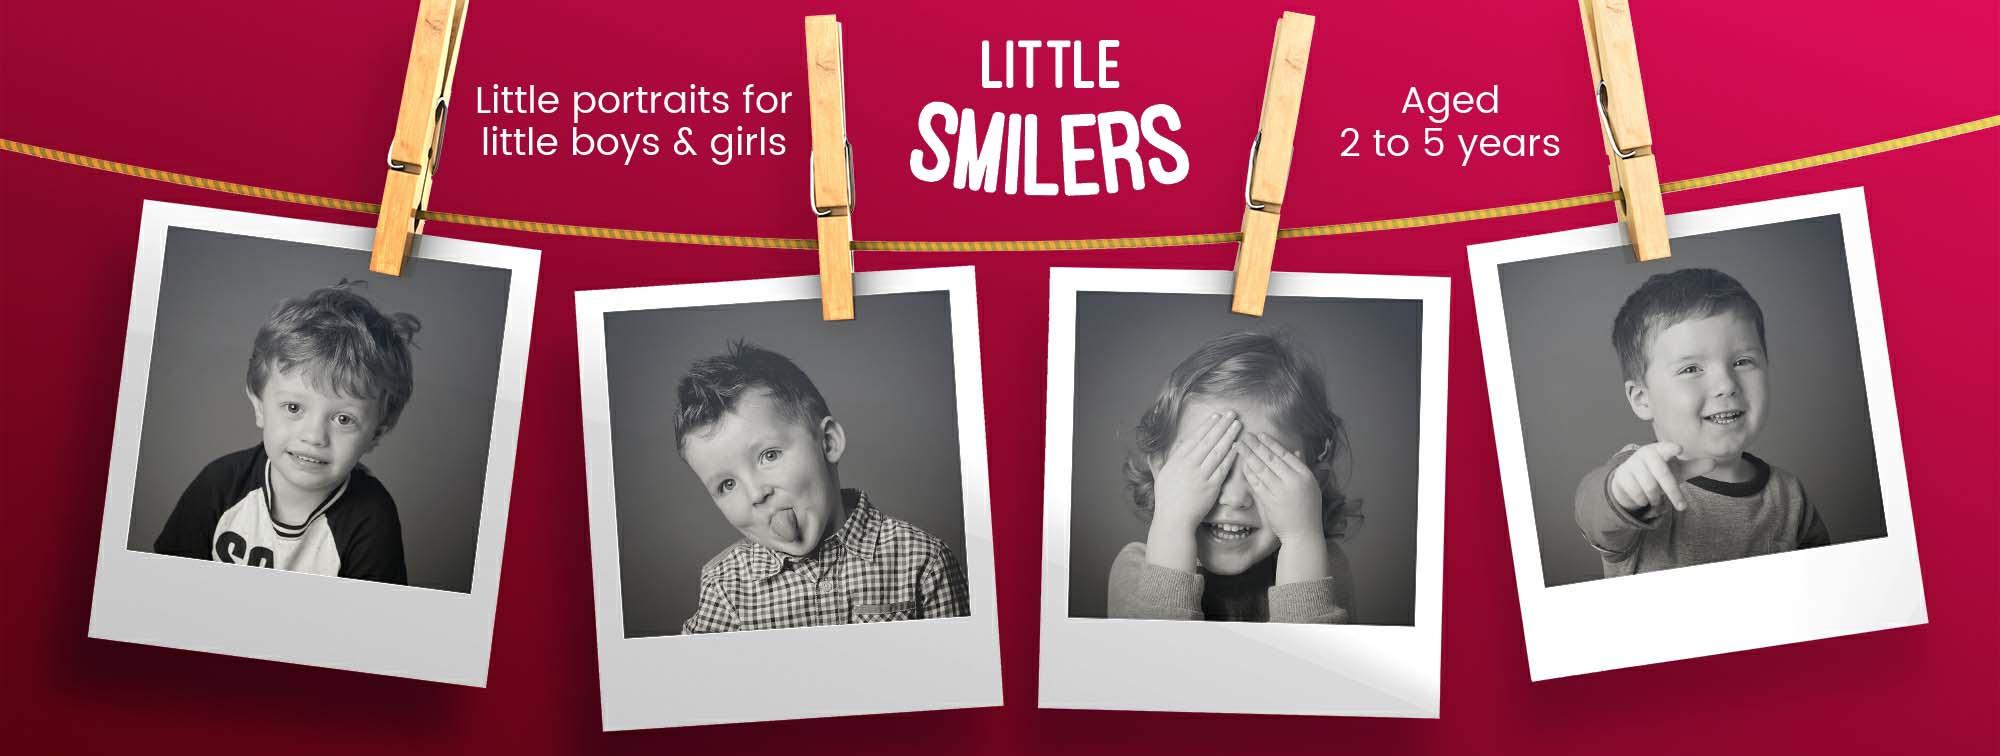 Little smilers child portraits Belfast